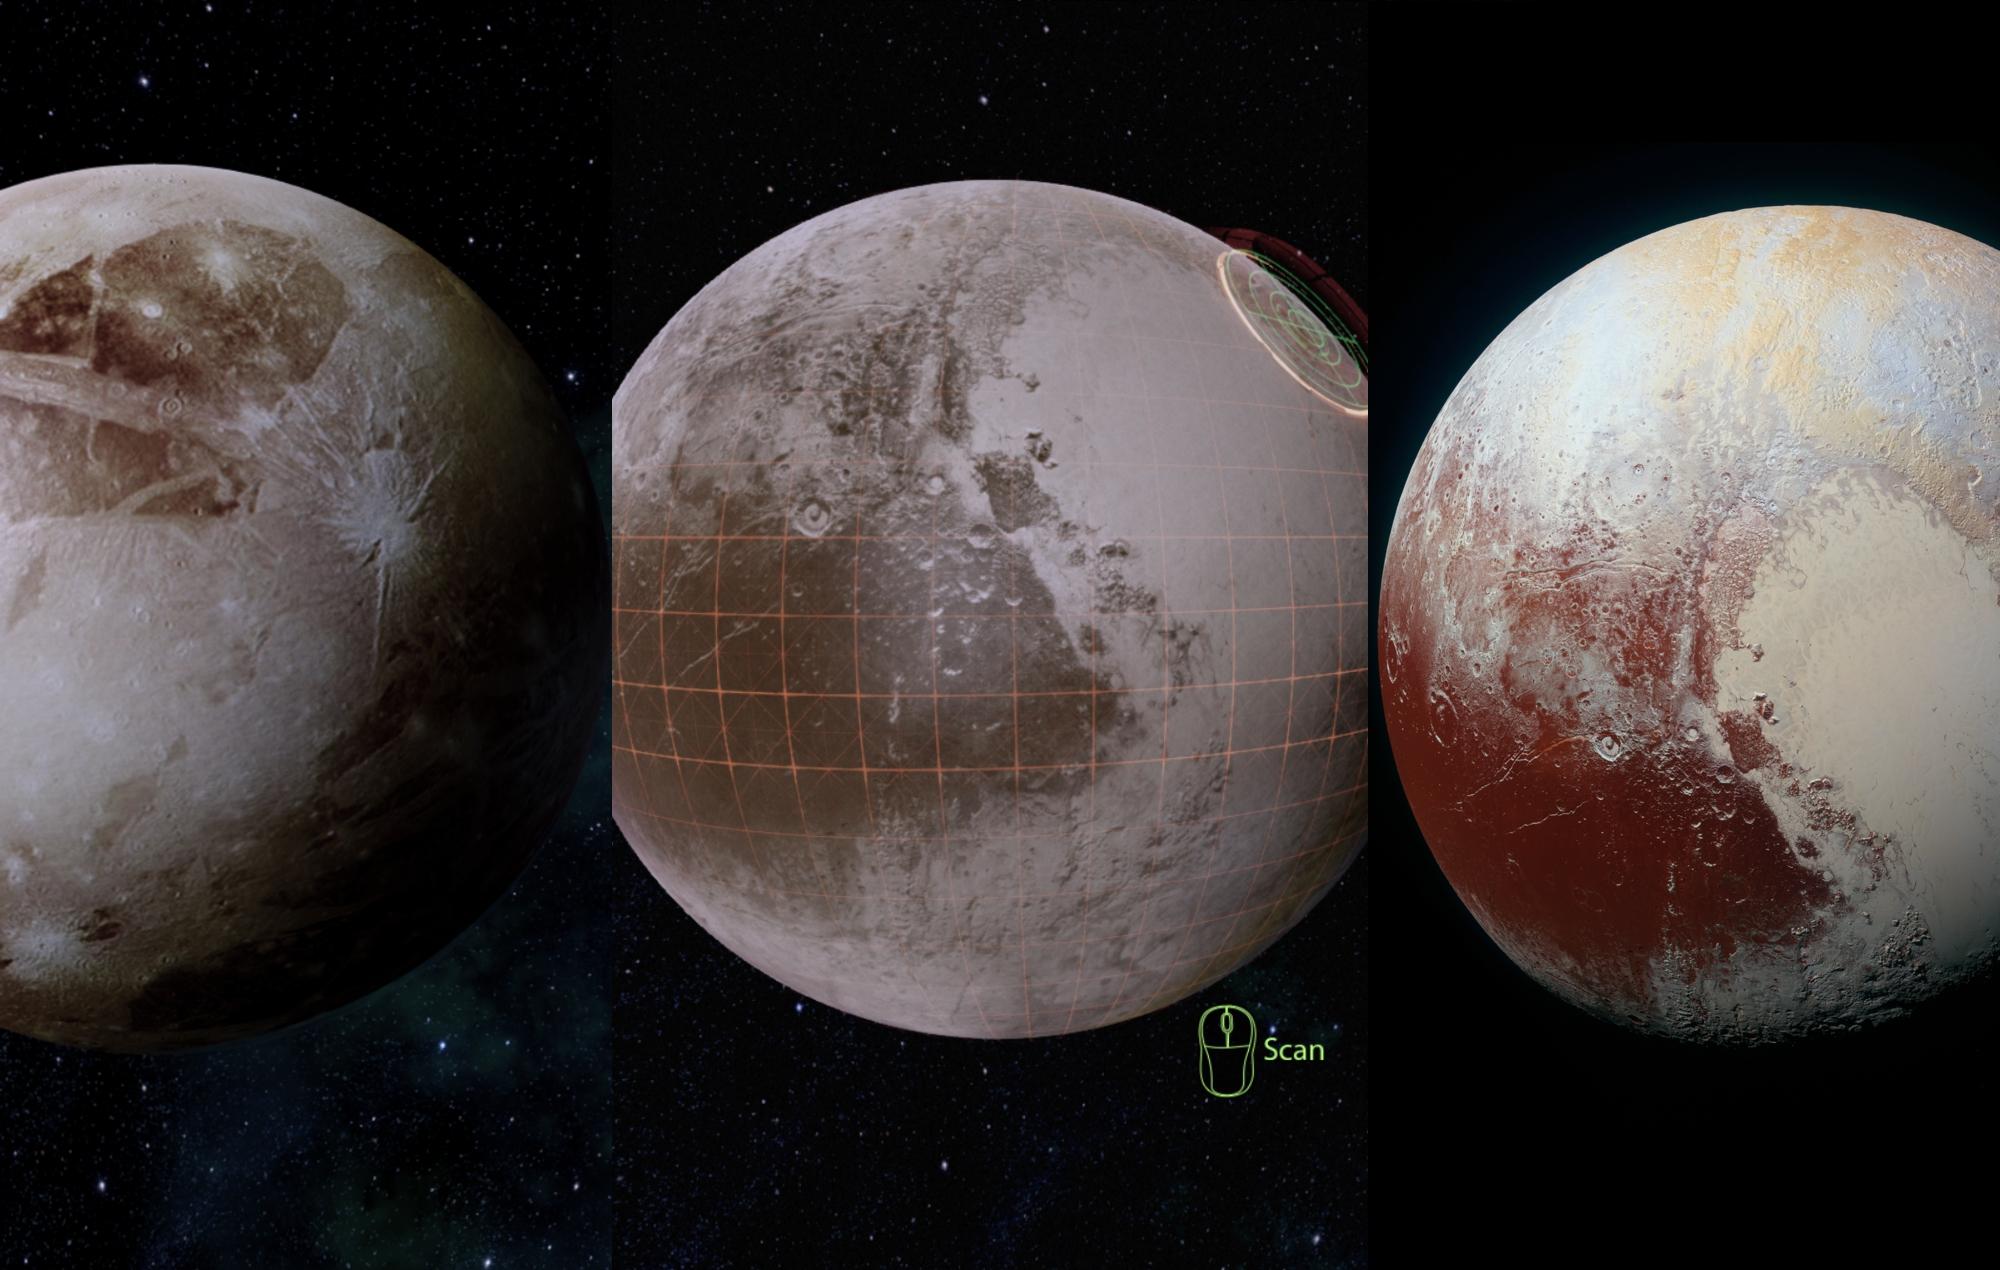 Mass effect legendary edition pluto render new horizons comparison NASA